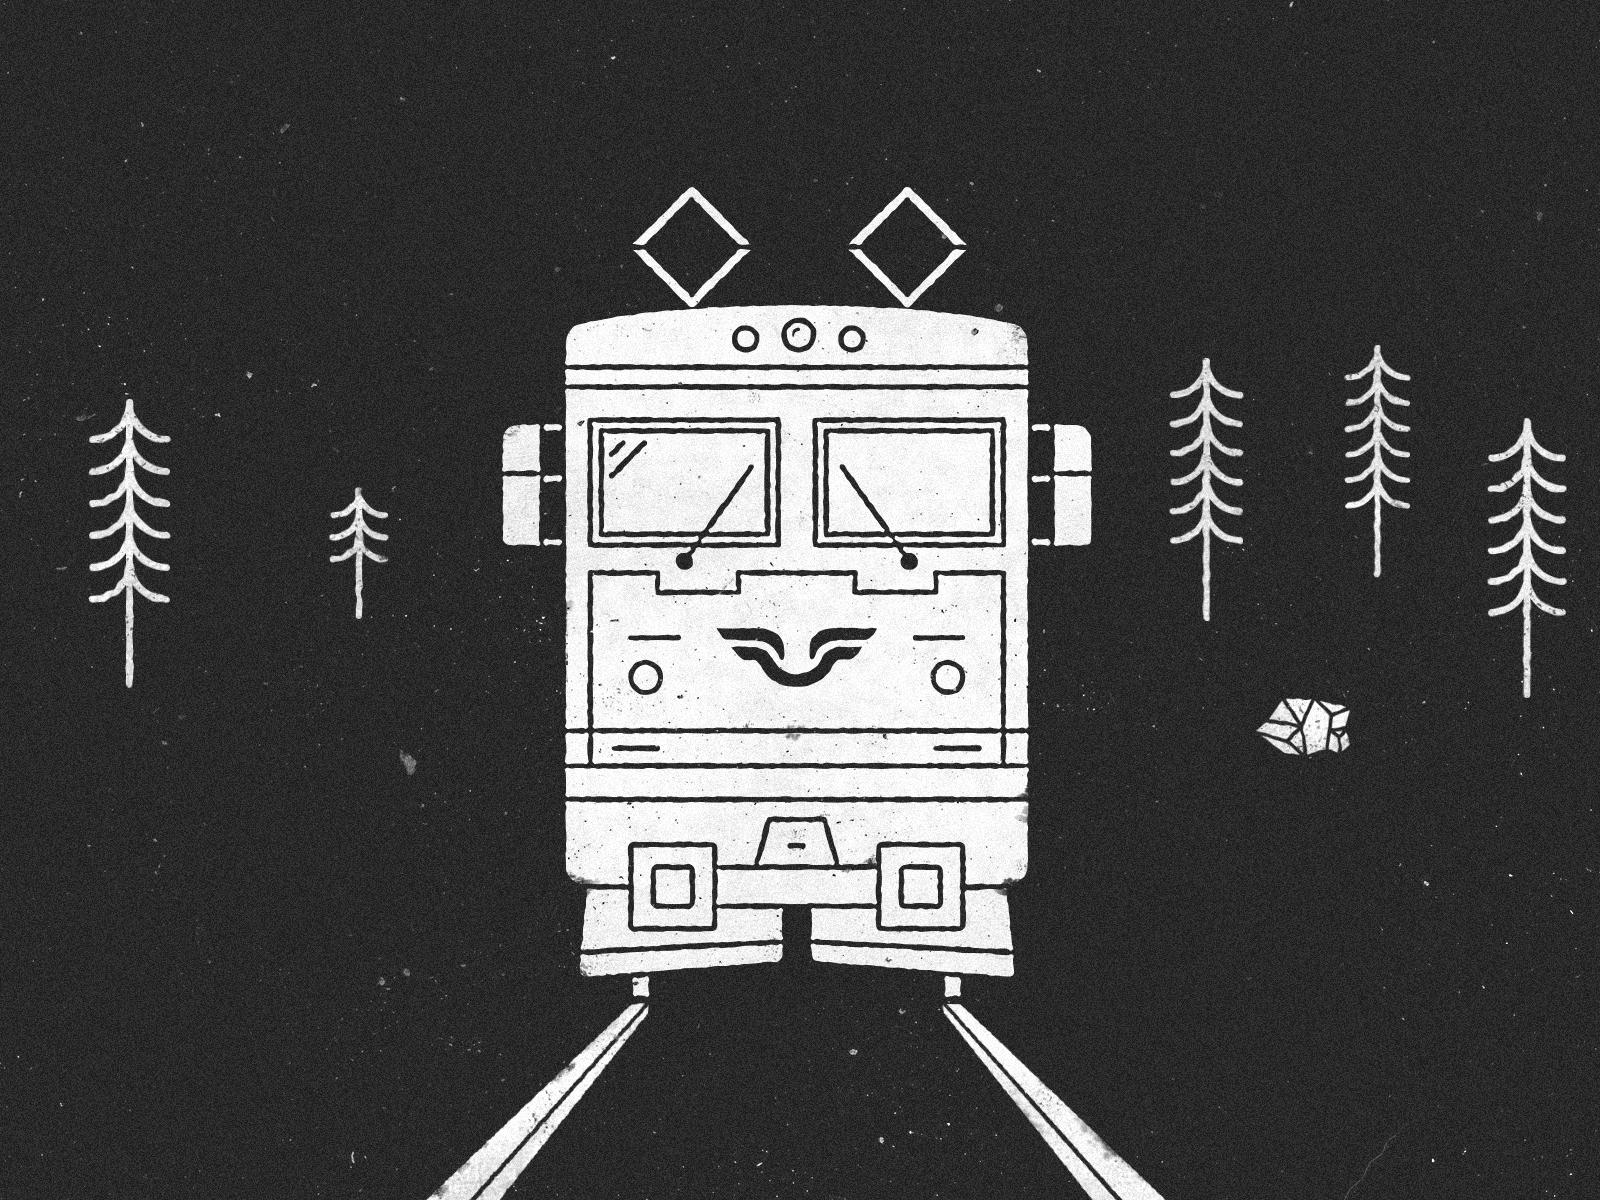 Train 1600